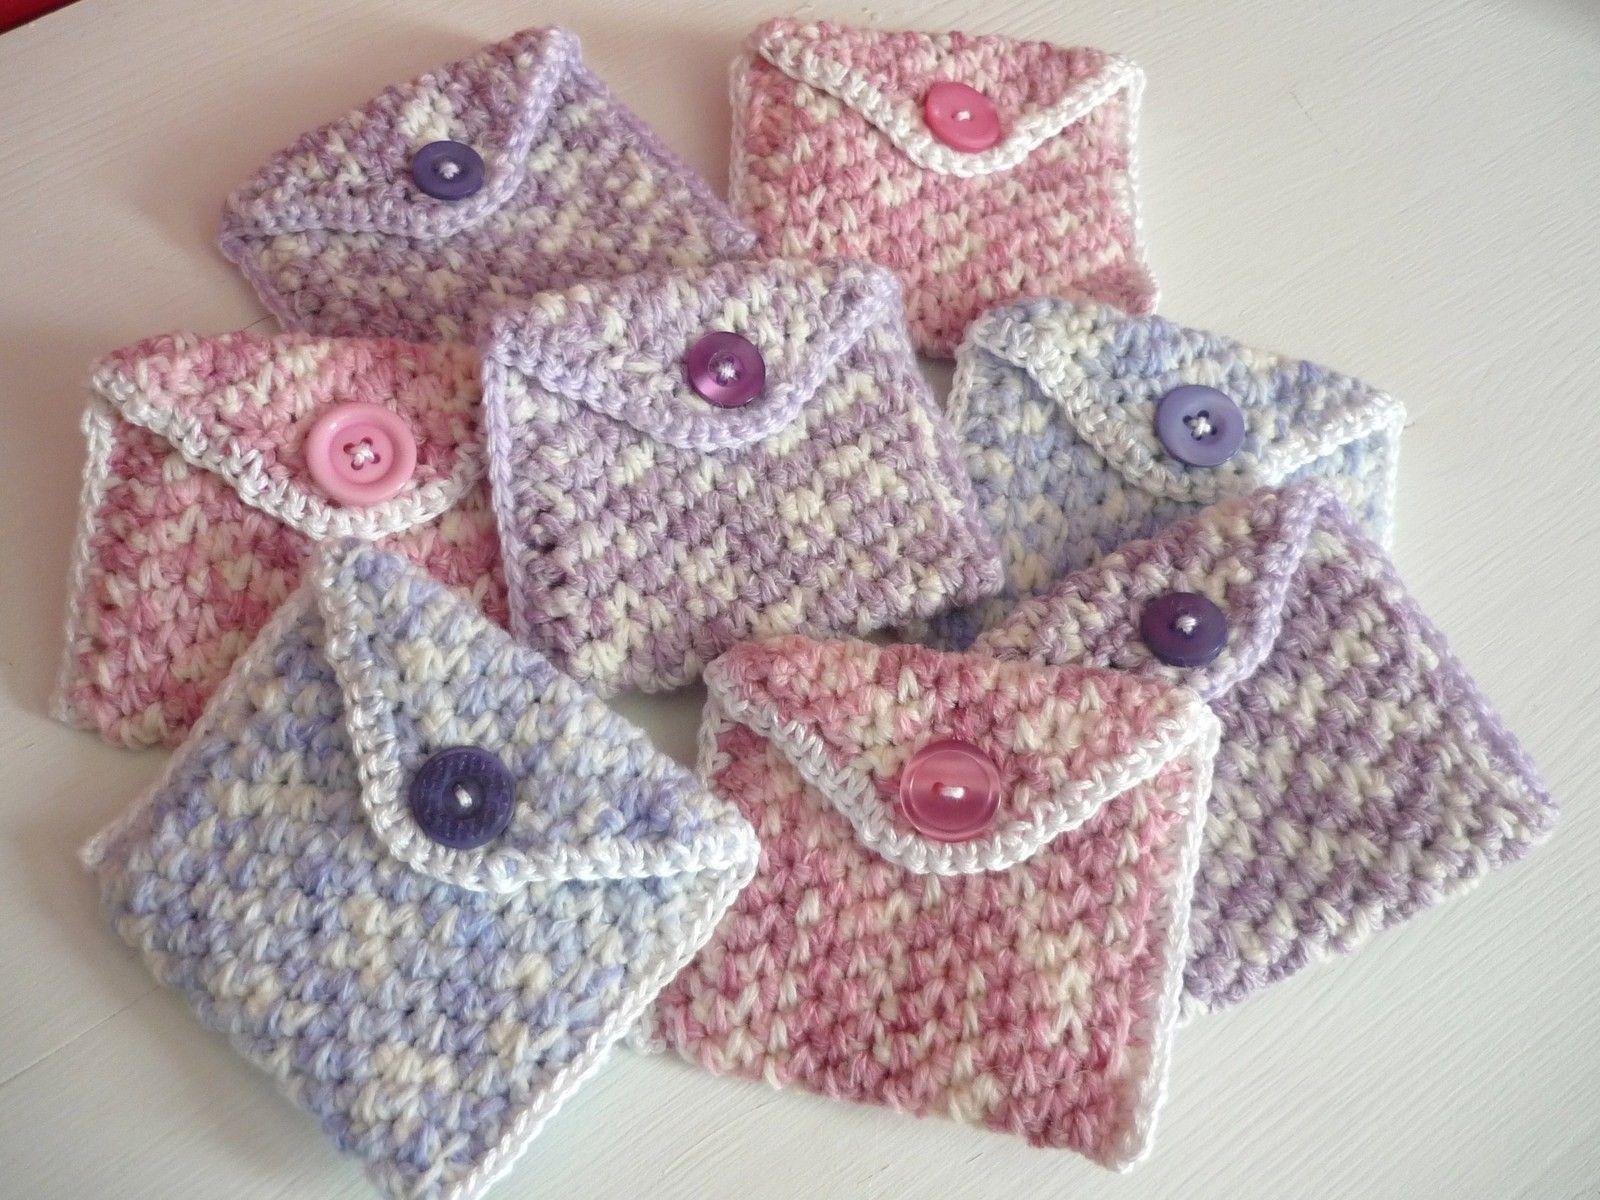 Easy Coin Purse Crochet Purse Patterns Crochet Change Purse Crochet Coin Purse